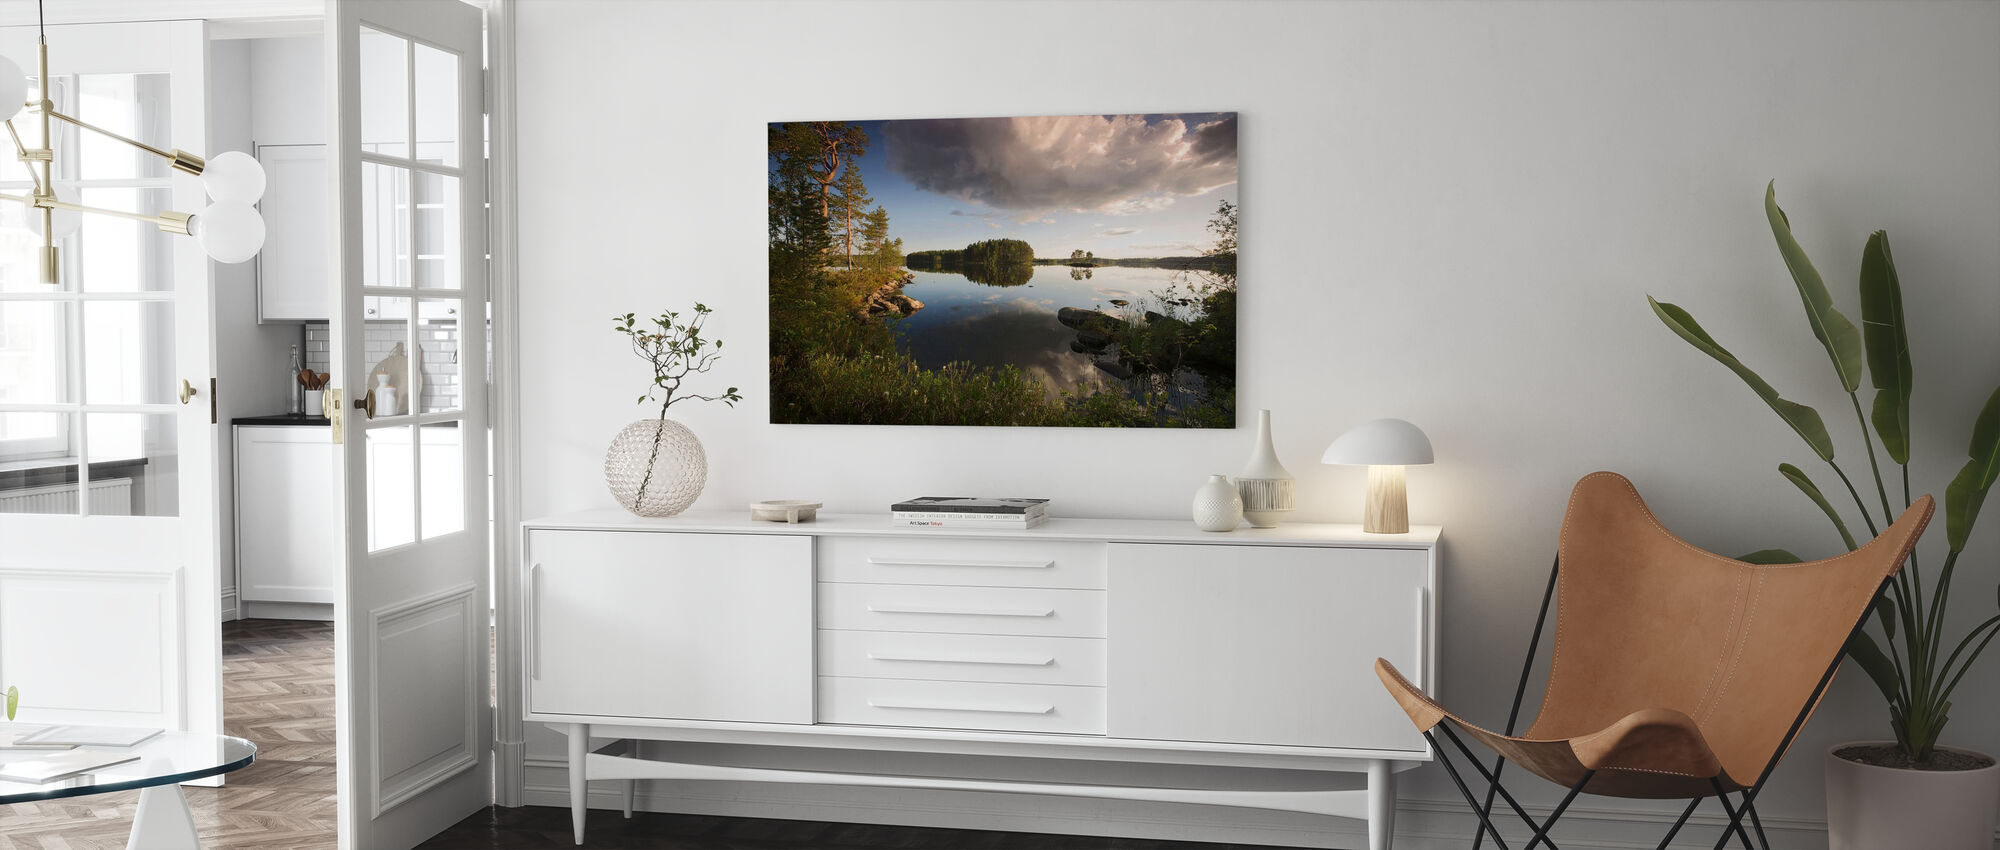 Swedish Summer Landscape - Canvas print - Living Room